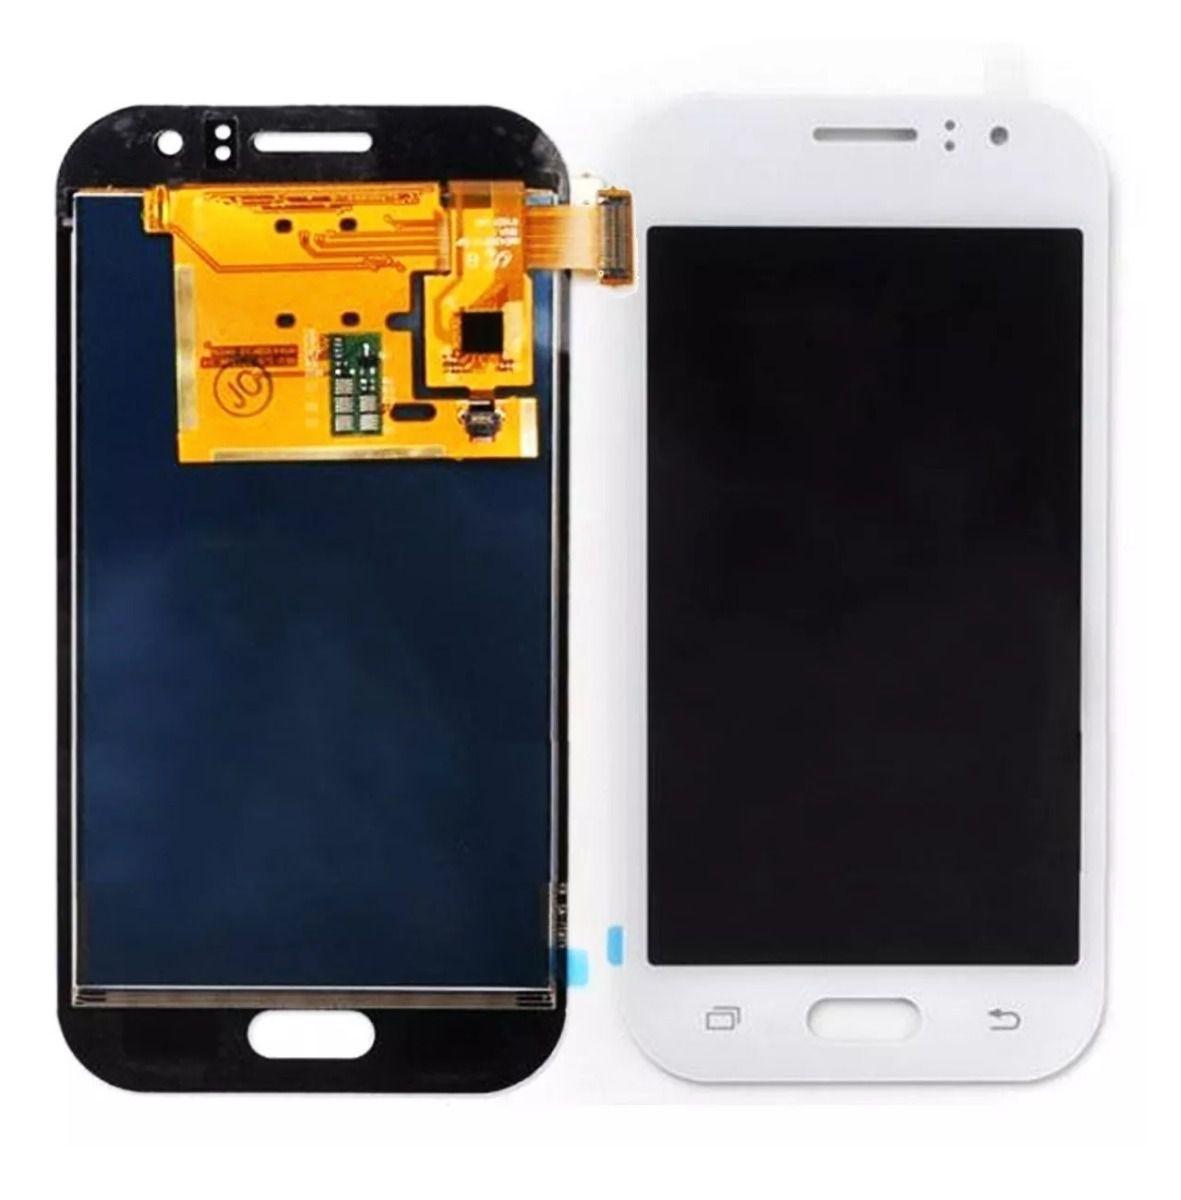 Frontal Tela Touch Display Lcd Samsung Galaxy Ace J1 J110 j110 BRANCO